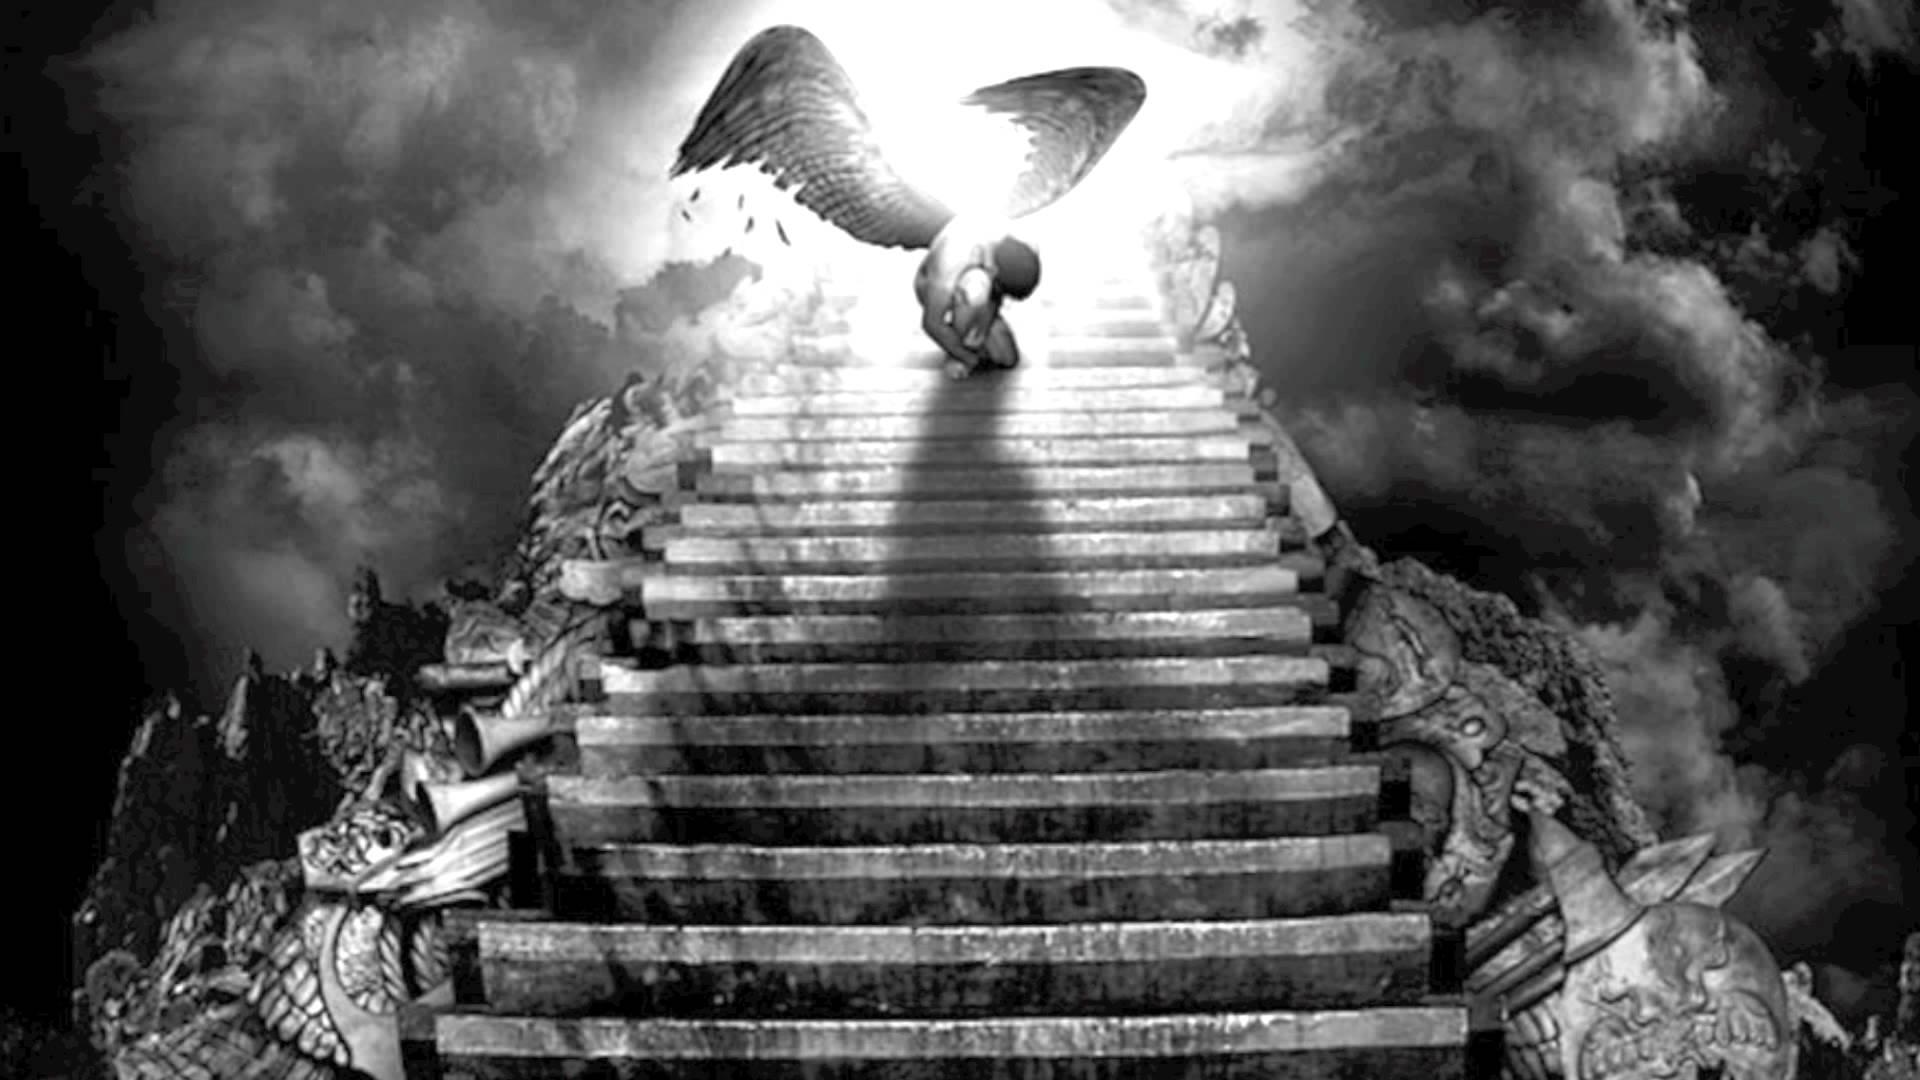 Haven clipart staircase To heaven Stairway Heaven Zeppelin